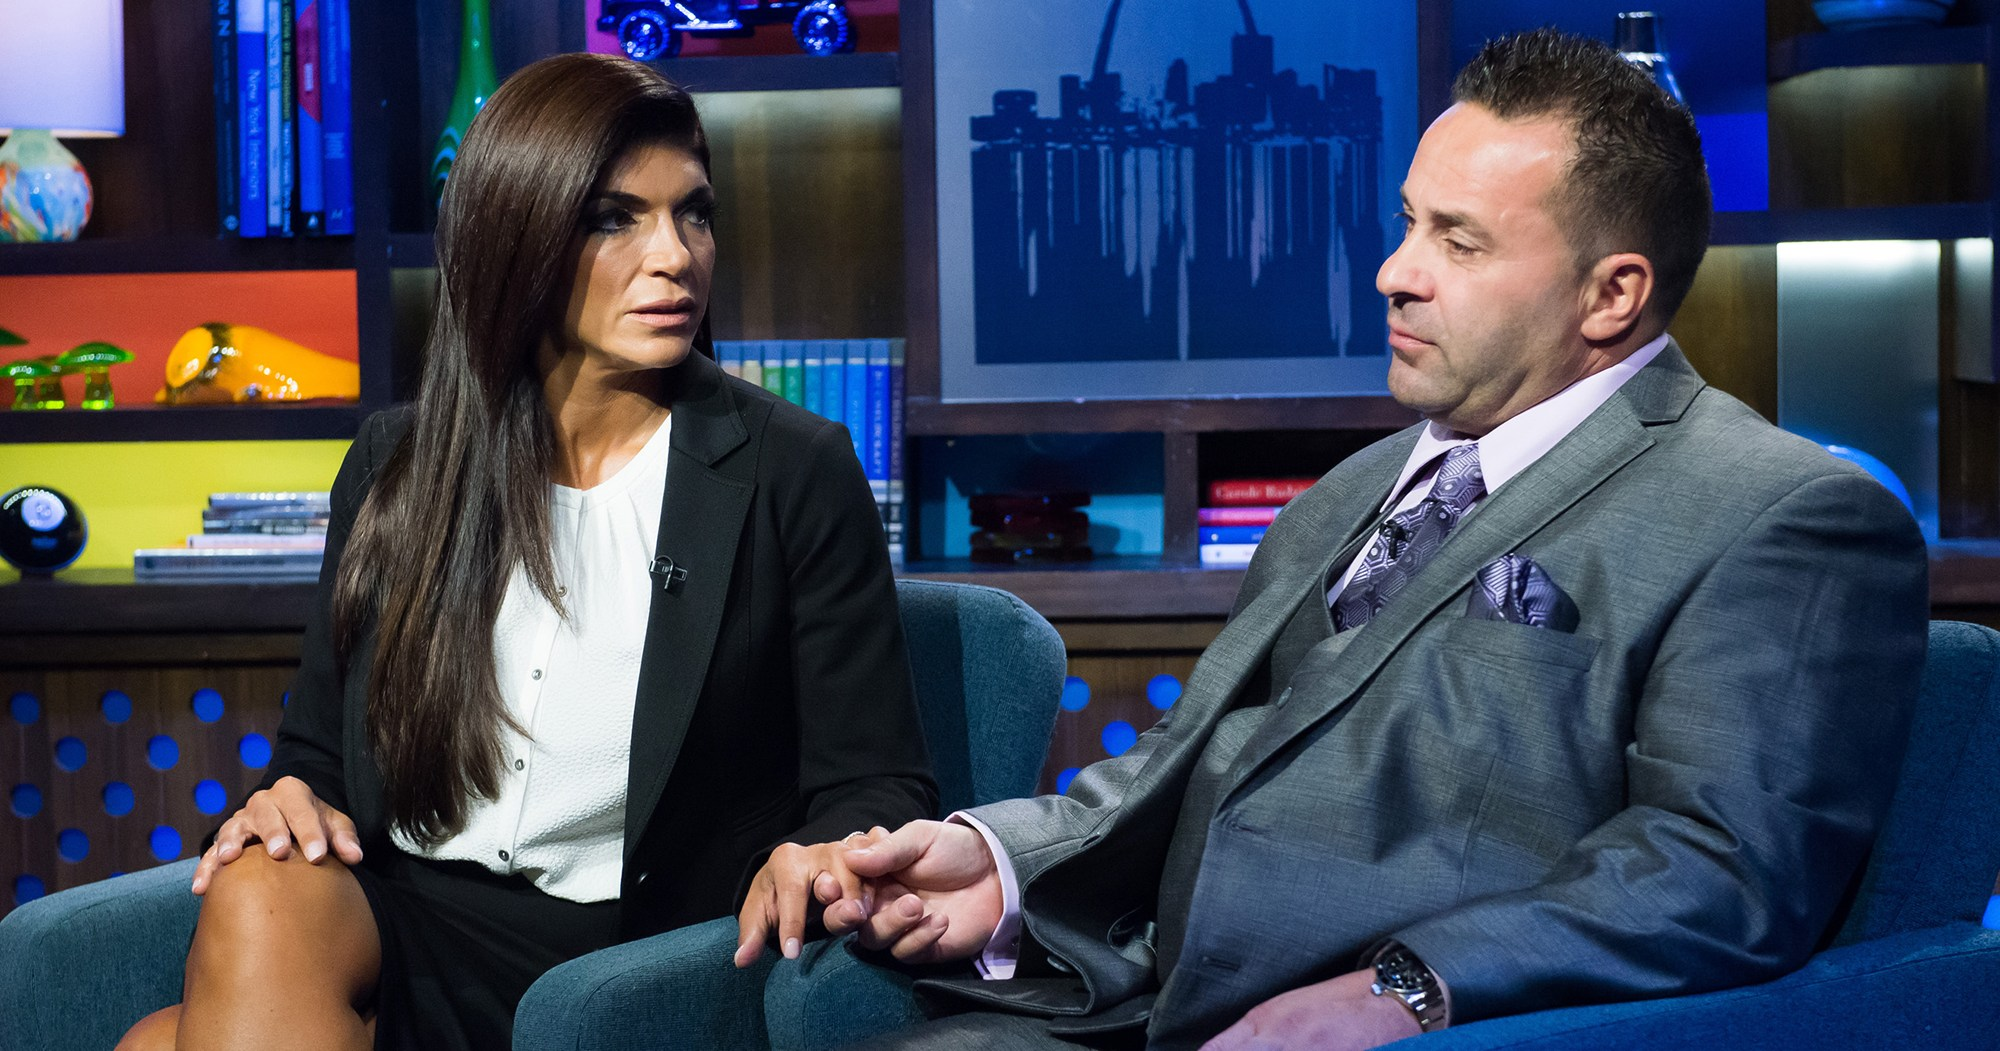 Melissa Gorga, Dolores Catania and More 'RHONJ' Stars Reveal How Teresa Giudice Is Coping With Joe Giudice in Ice Custody